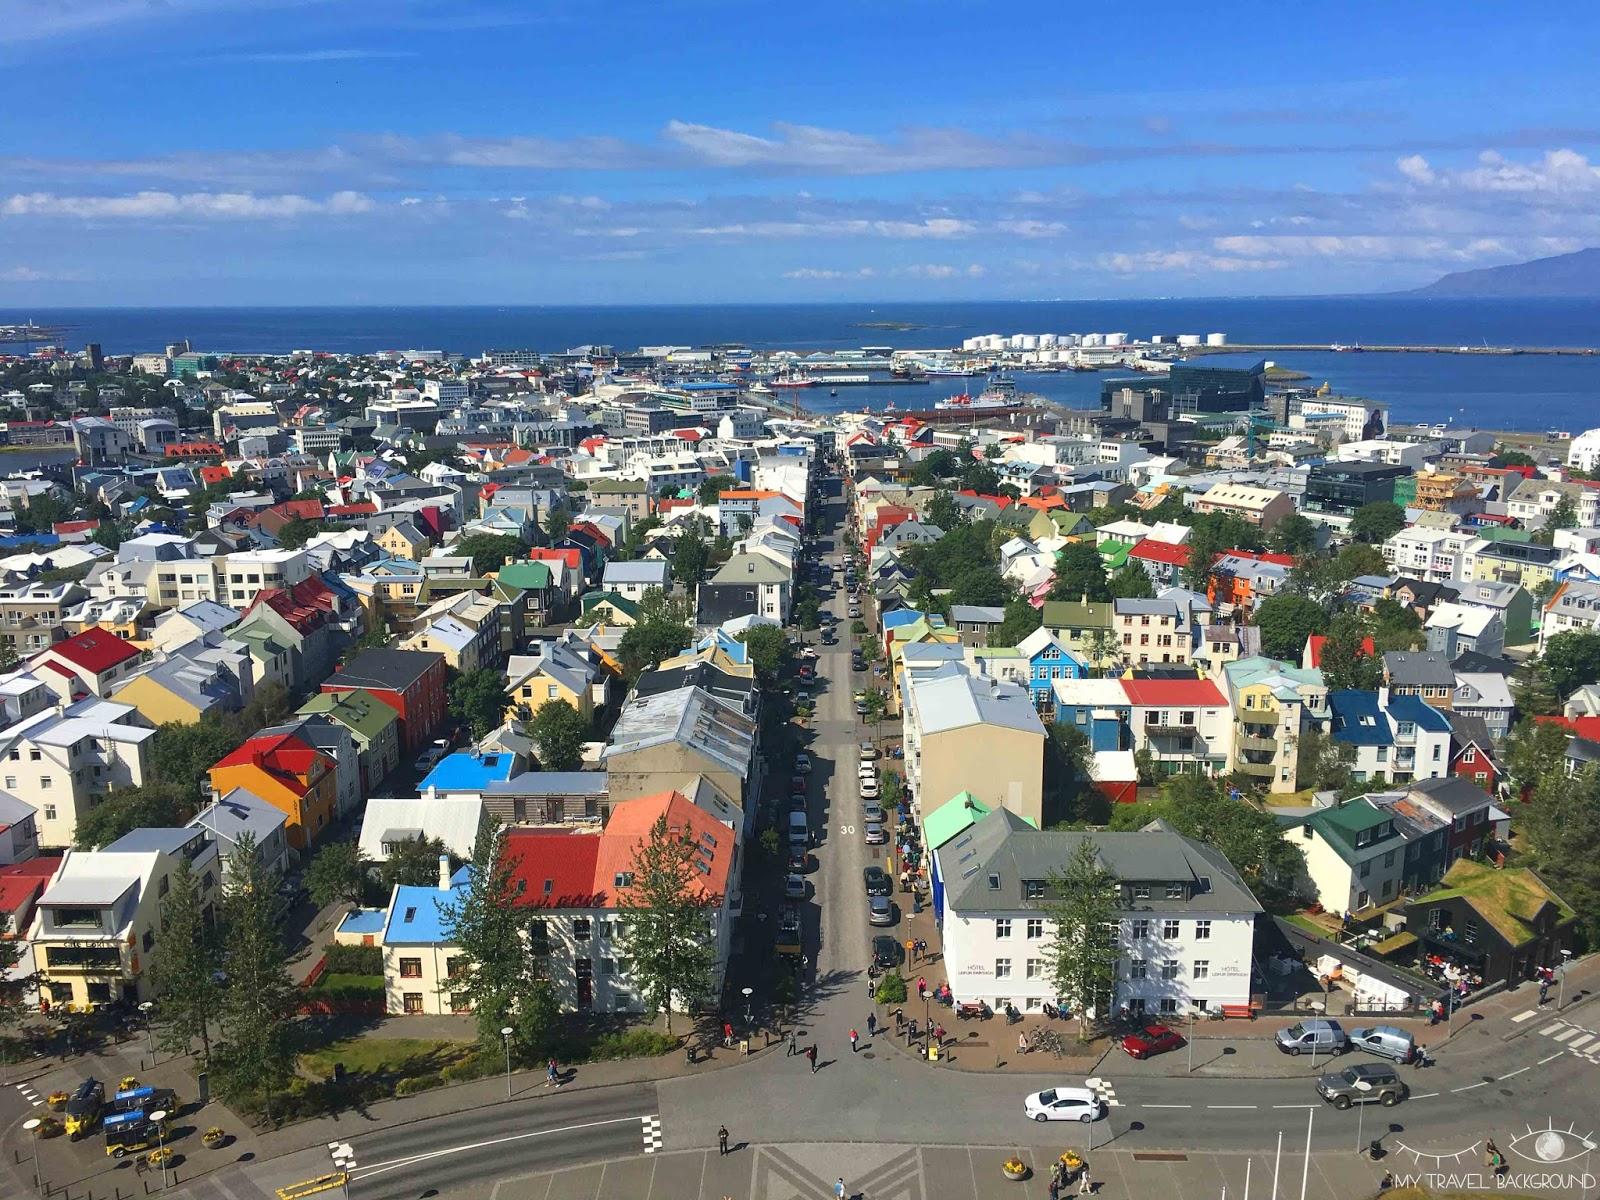 My Travel Background : Road Trip en Islande, itinéraire et infos pratiques / Reykjavik